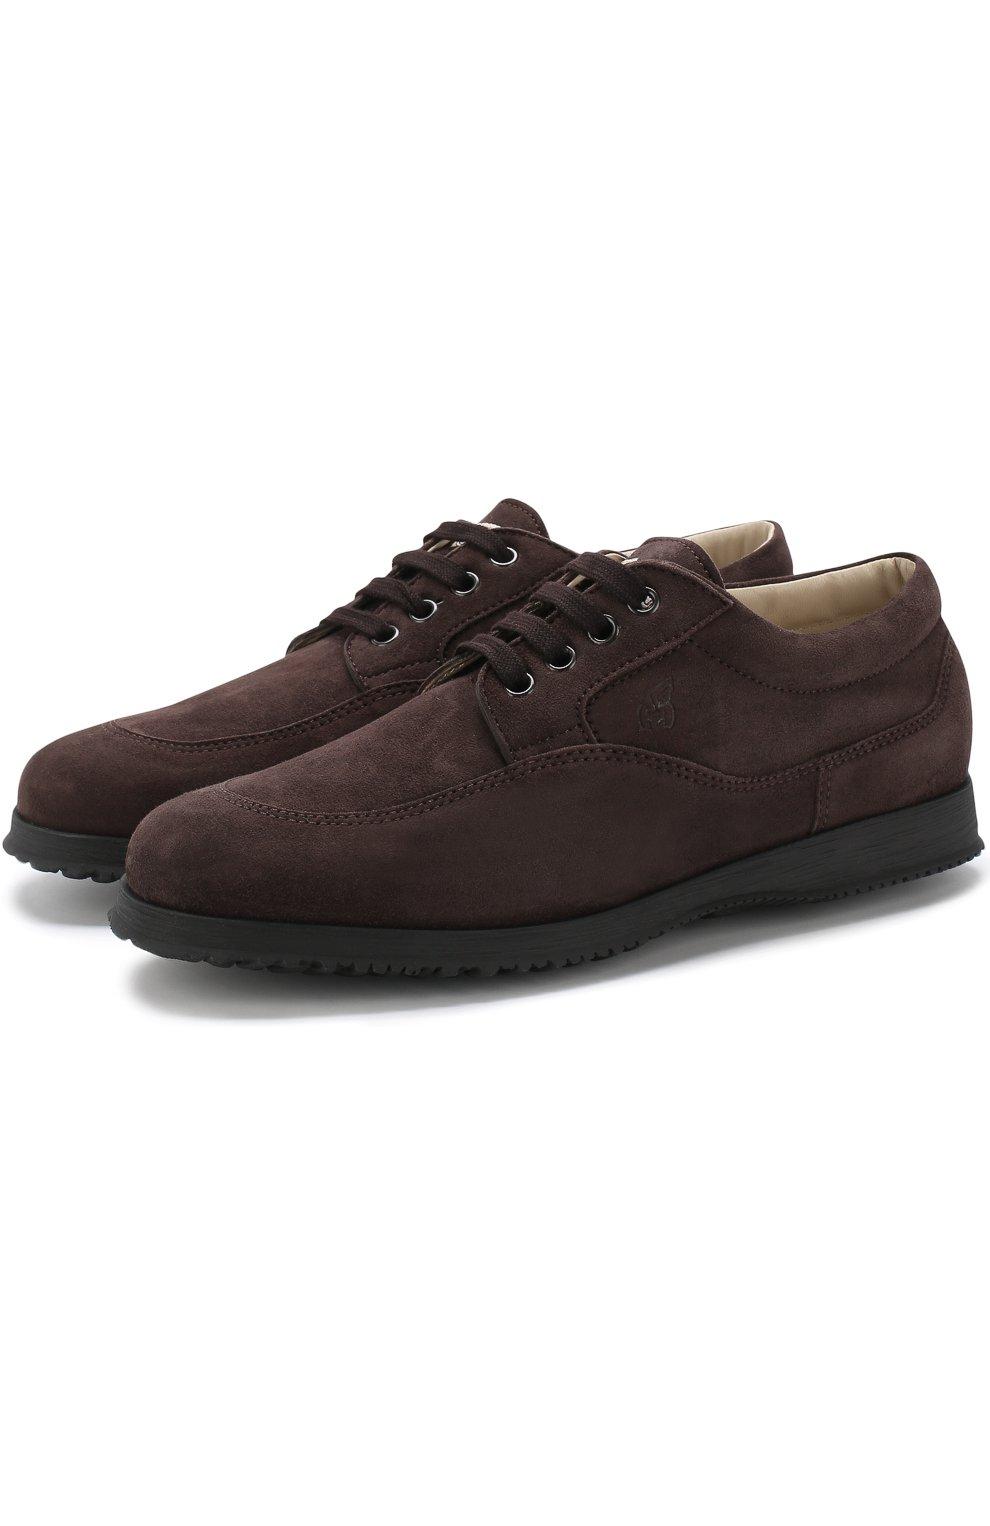 Замшевые ботинки Traditional на шнуровке | Фото №1